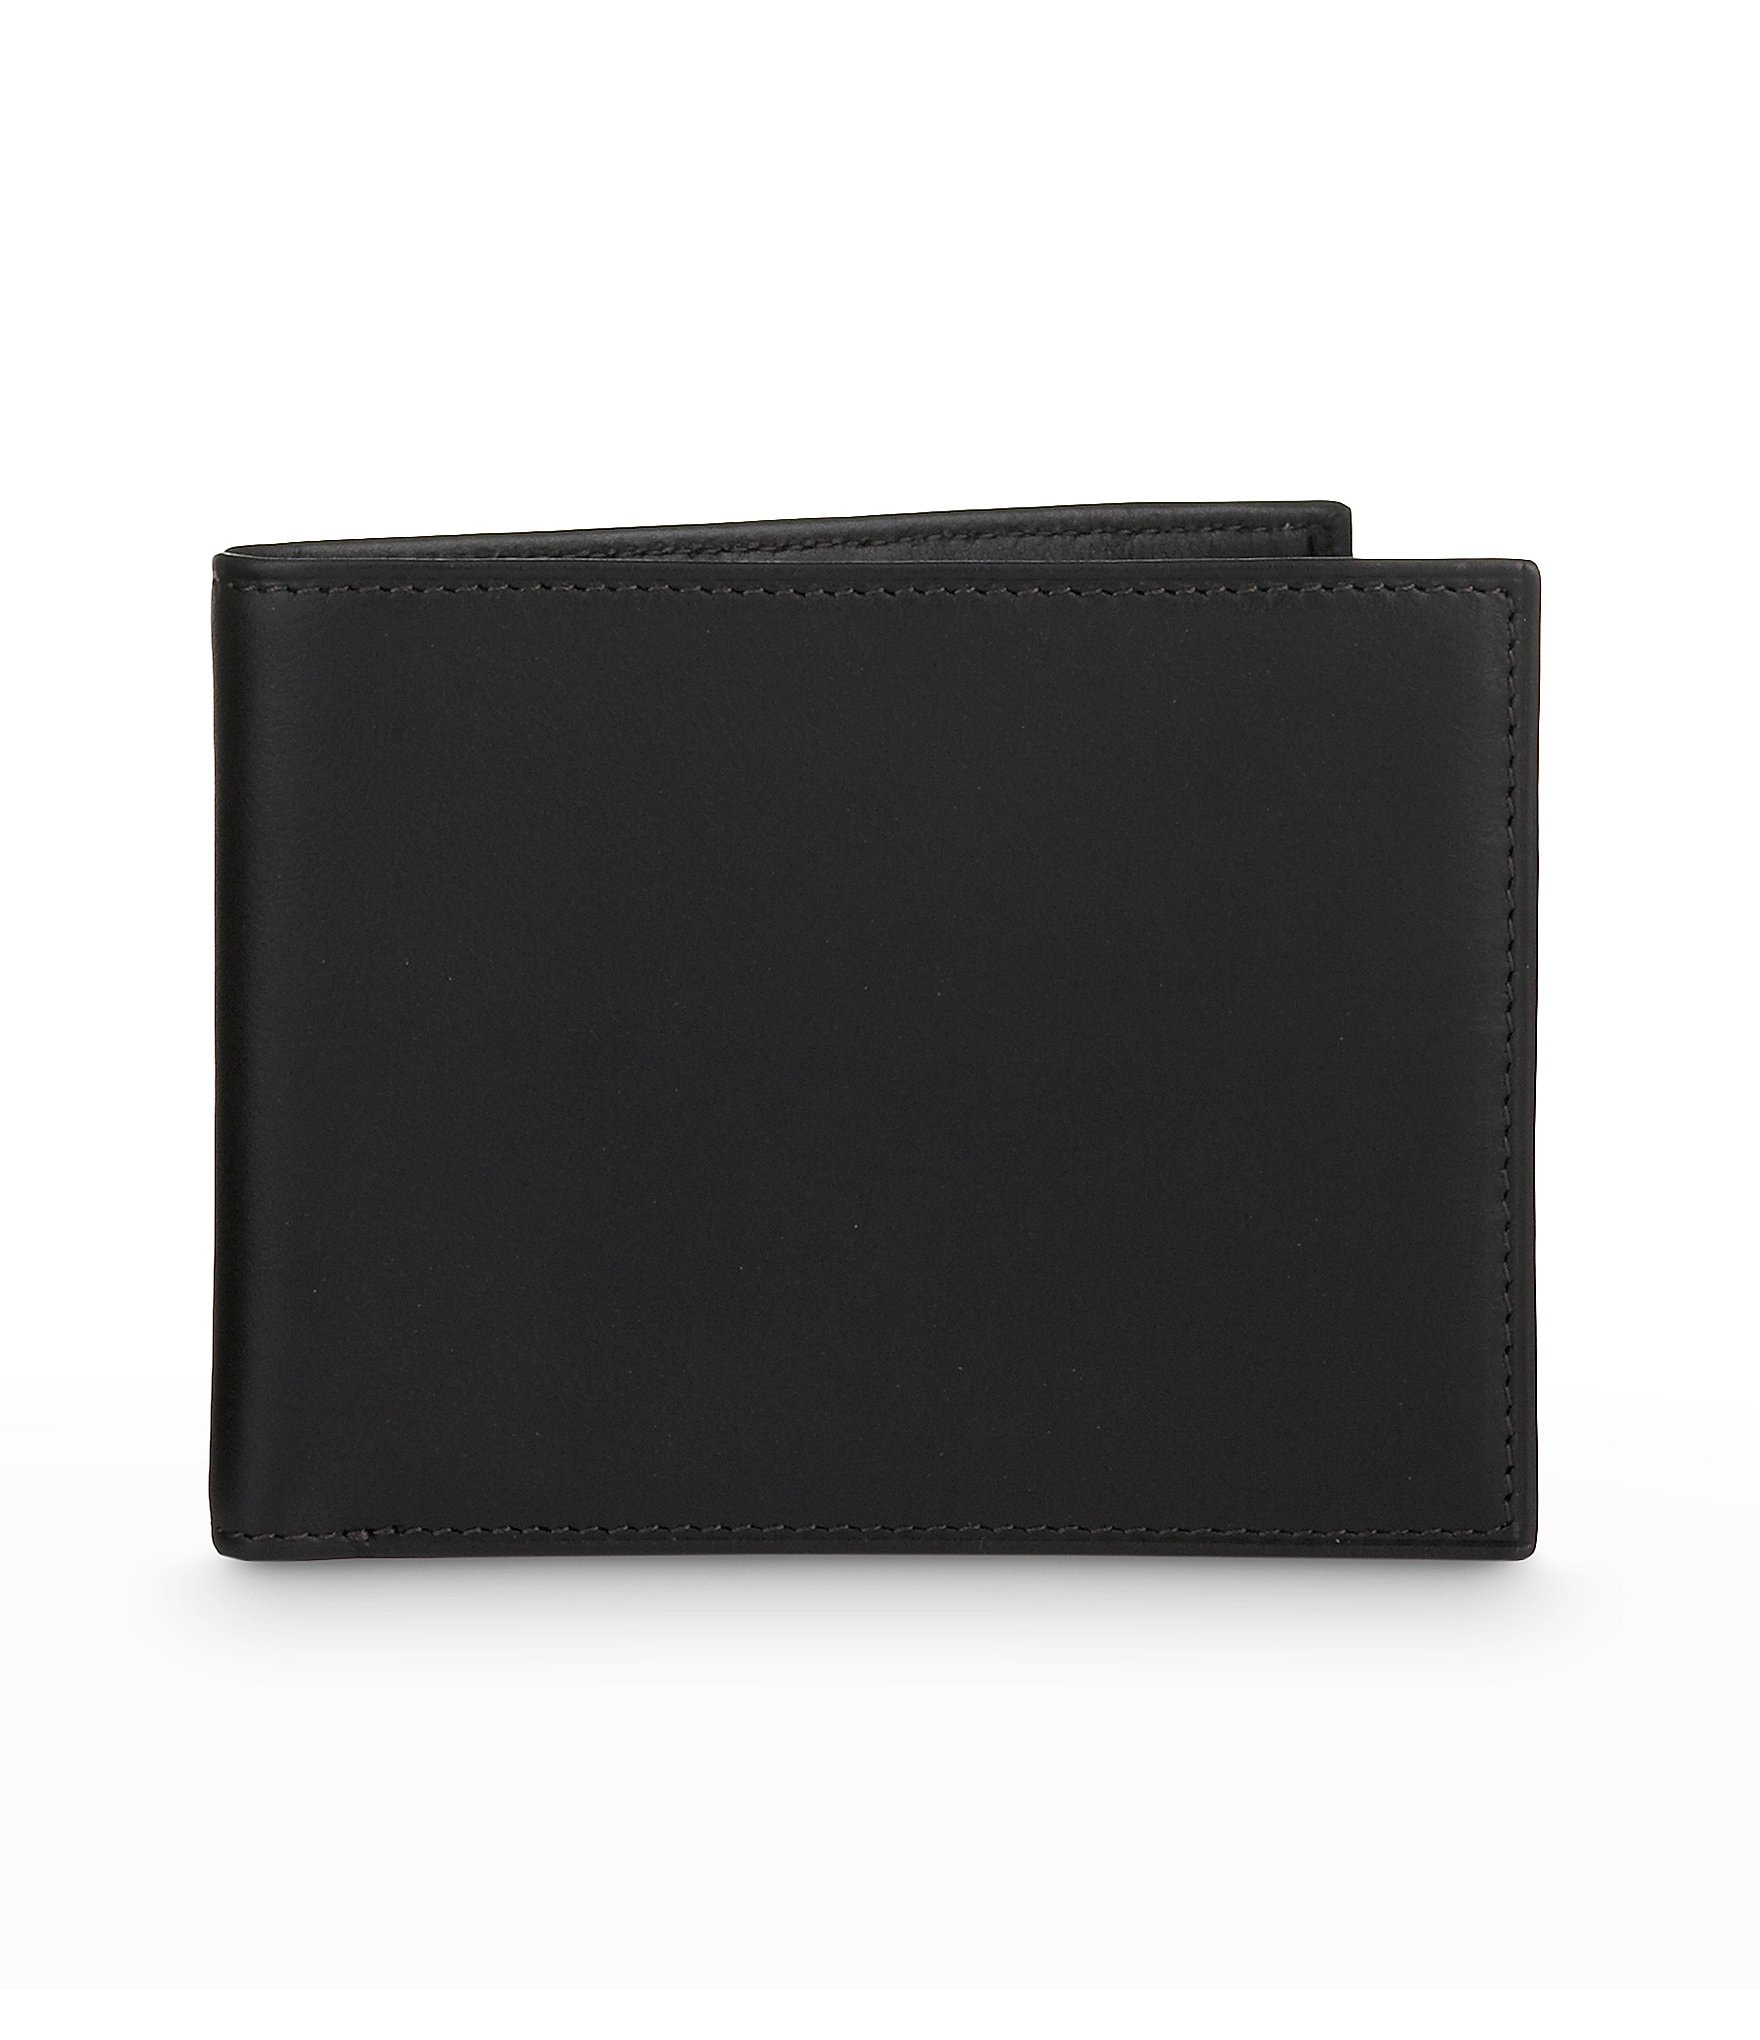 f3917e522309 Bosca Executive ID Wallet